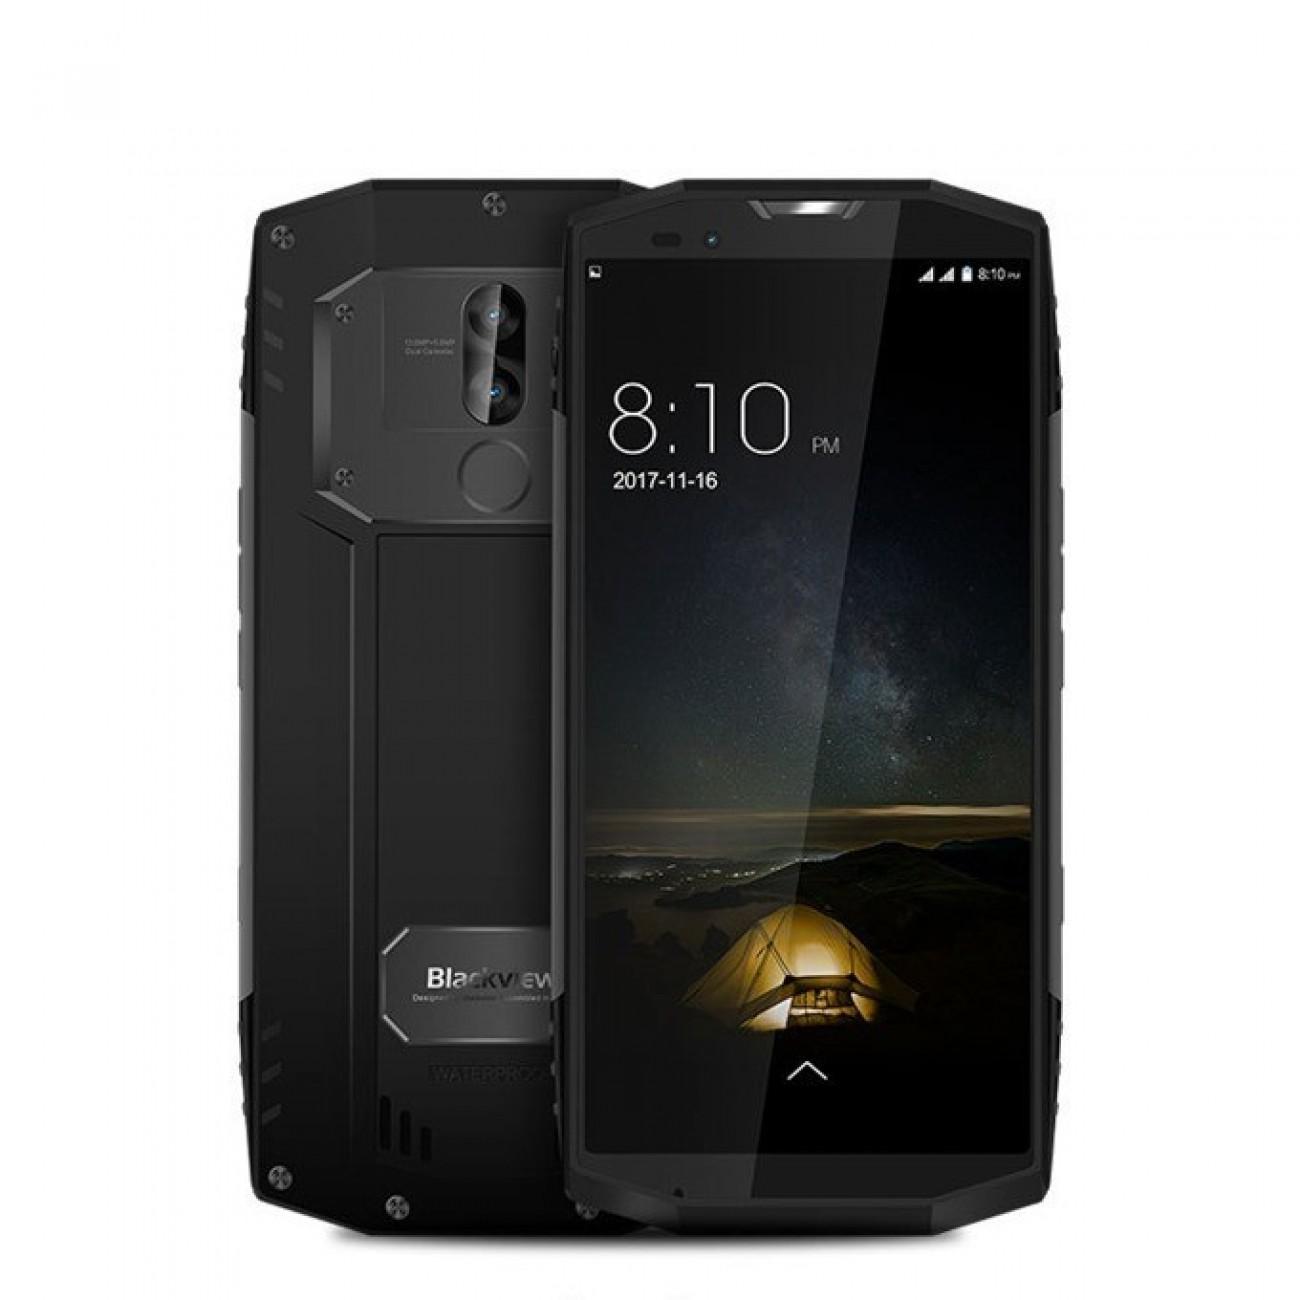 Blackview BV9000 Pro(сив), поддържа 2 sim карти, 5.7(14.48 cm) Full HD дисплей, осемядрен Helio P25 MTK6757CD 2.6GHz, 6GB RAM LDDR4, 128GB Flash памет(+microSD слот), 13&5 & 8.0 Mpix camera, Android, IP68 защита, 253 g в Мобилни телефони -  | Alle